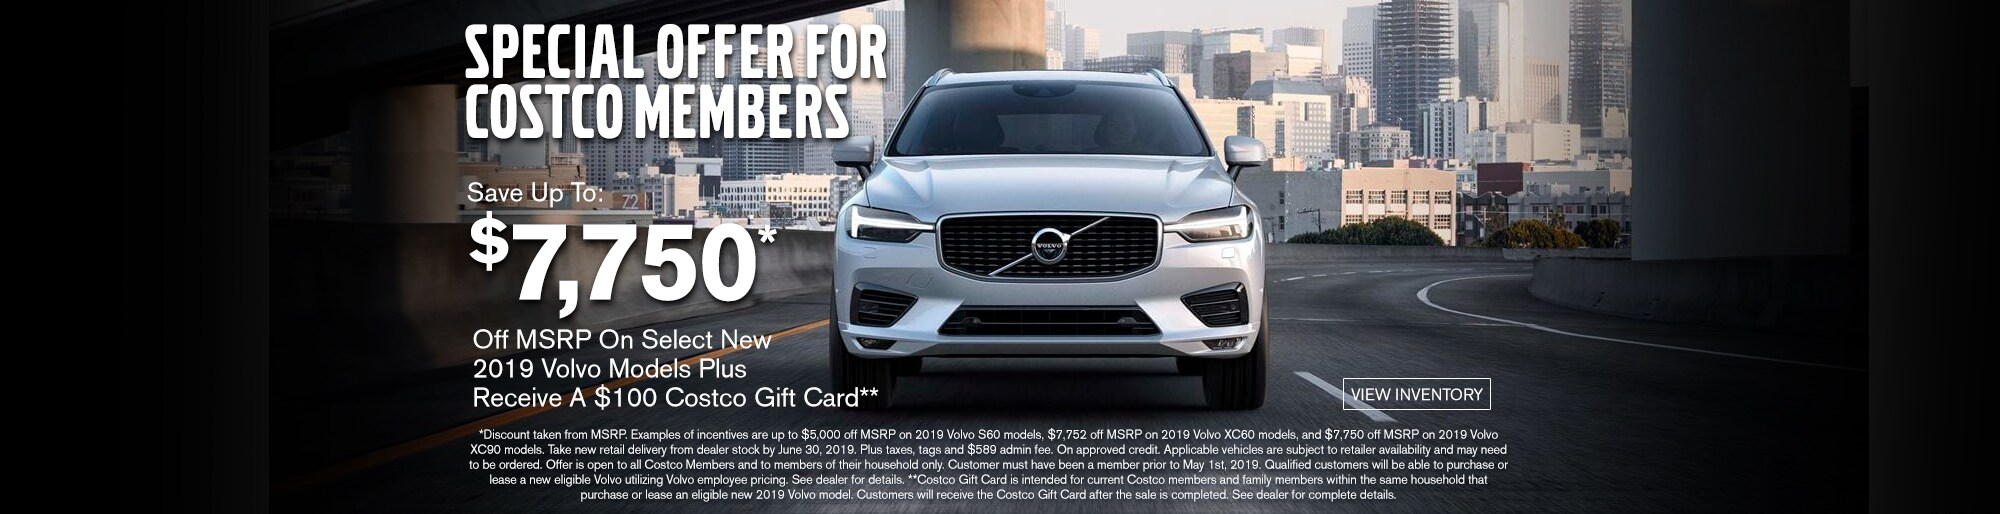 Costco Members Offer Volvo Cars Burlington